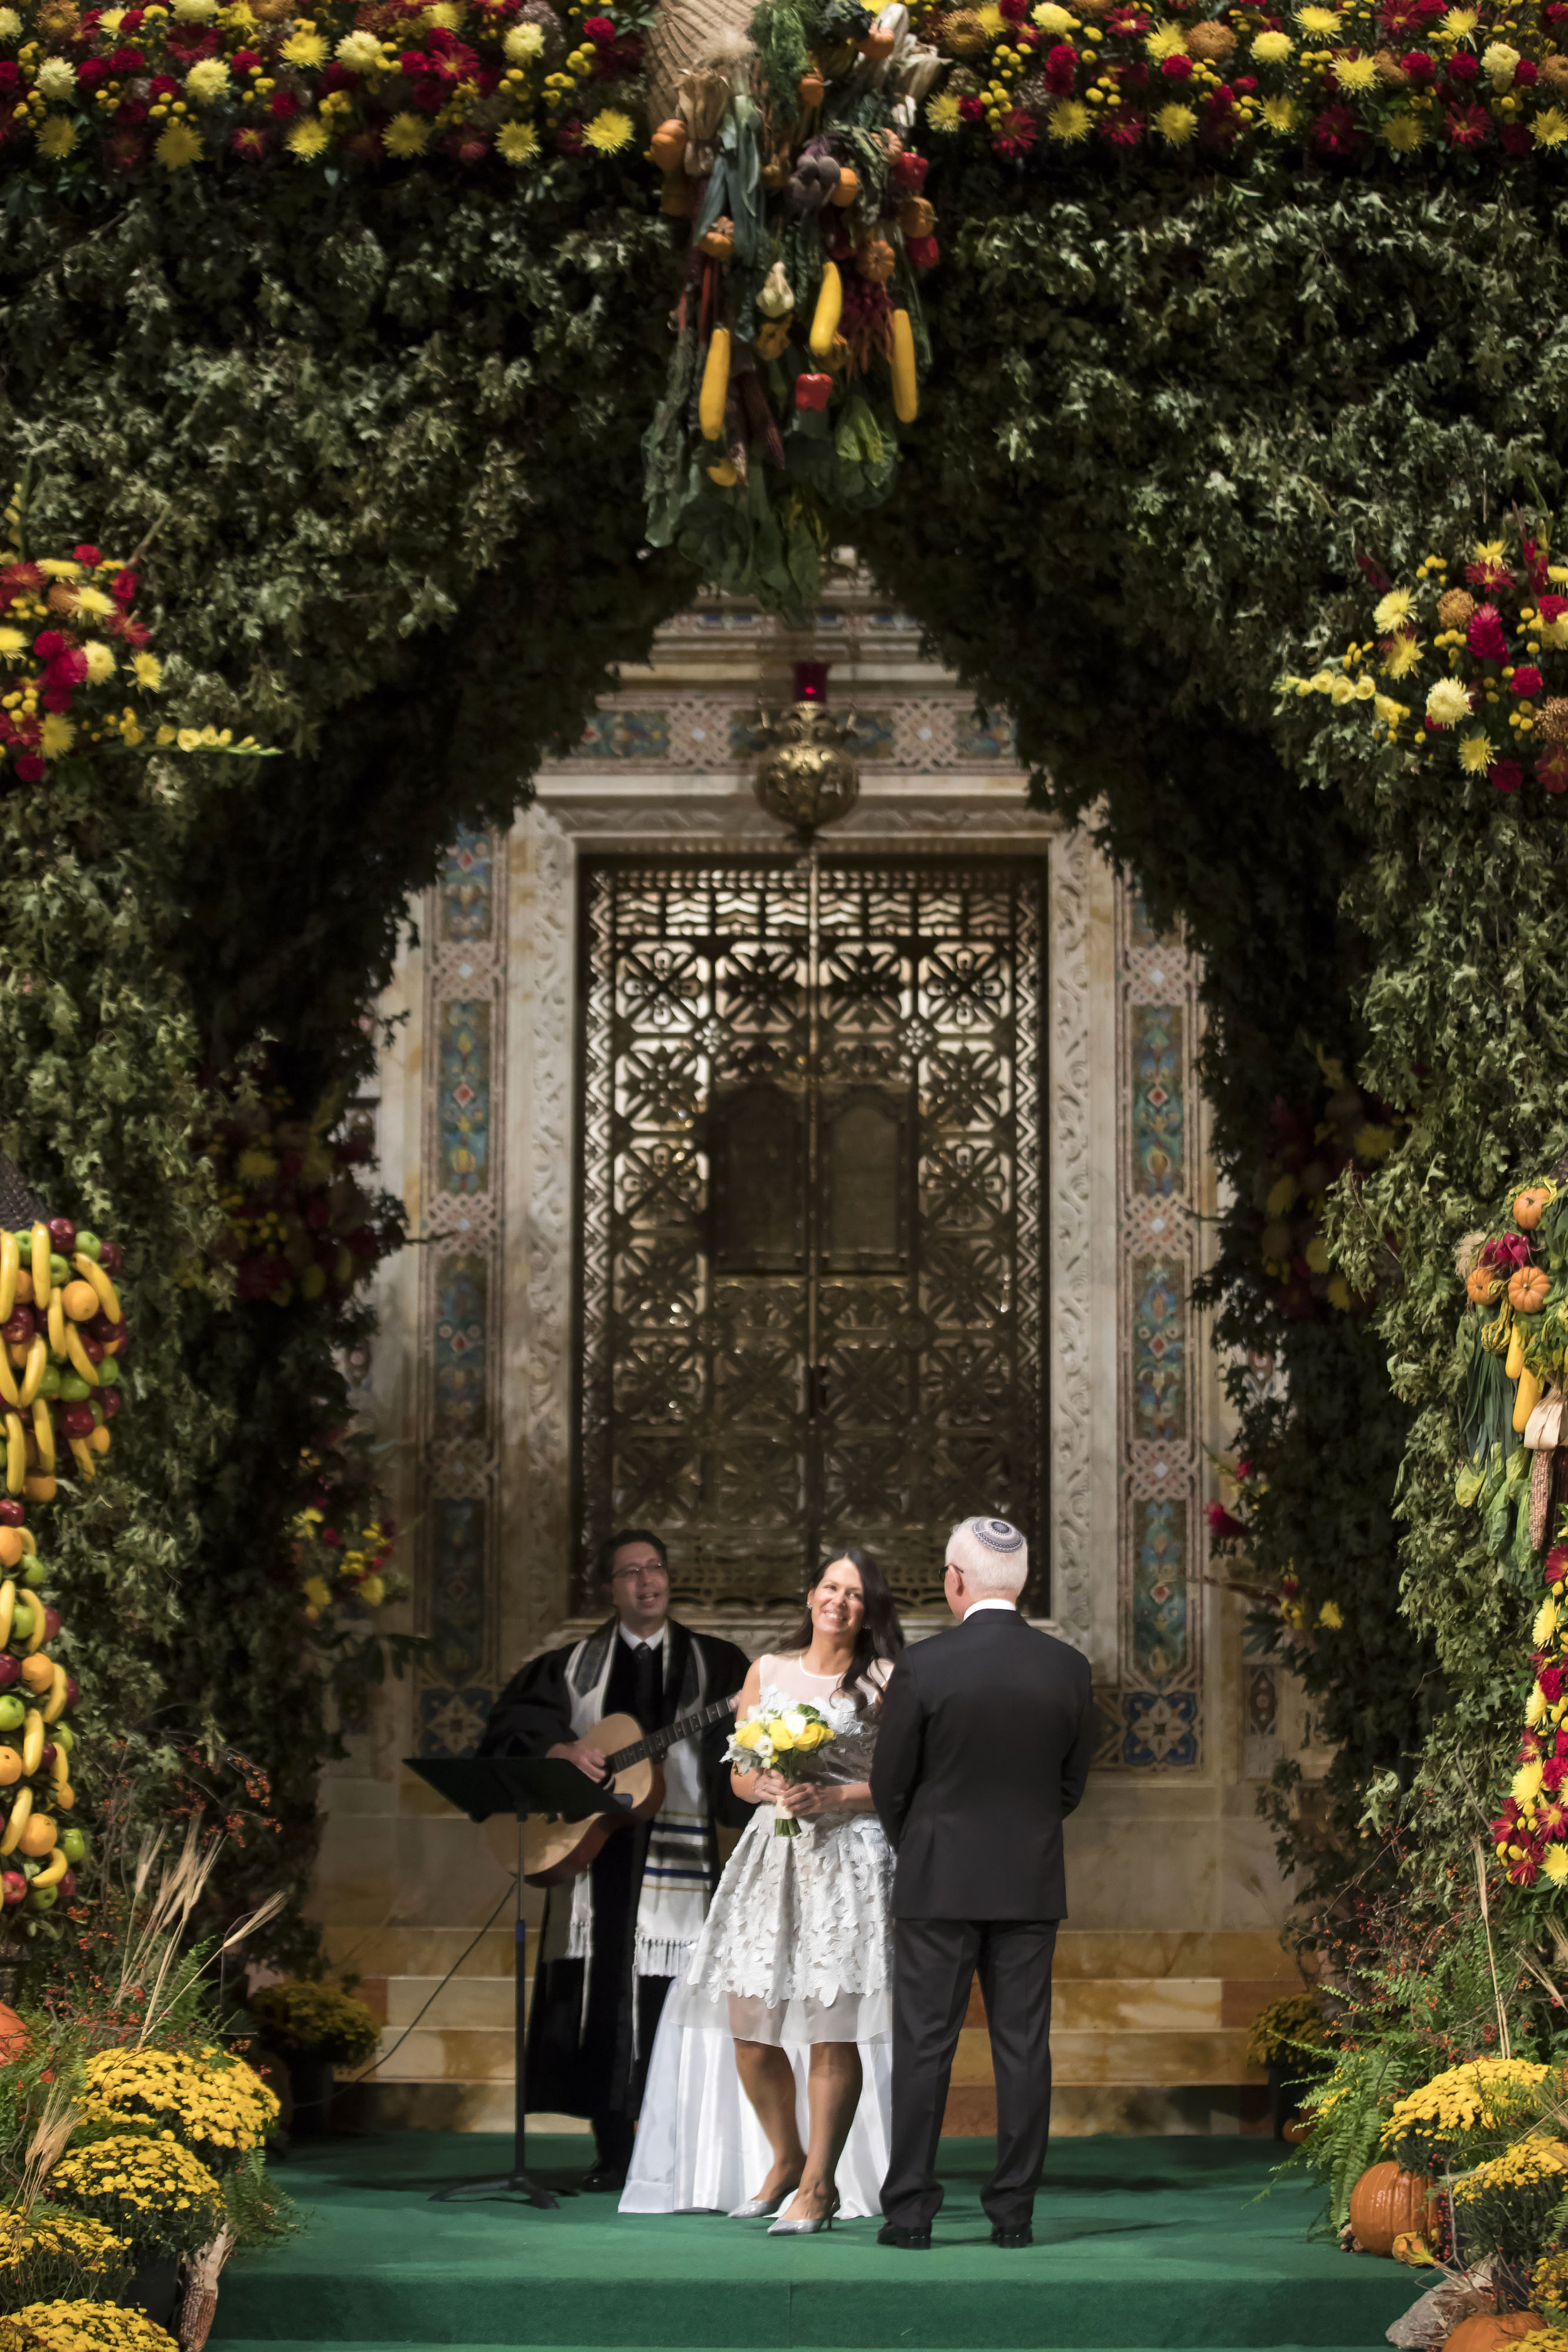 synagogue-wedding-photographer-1228.JPG